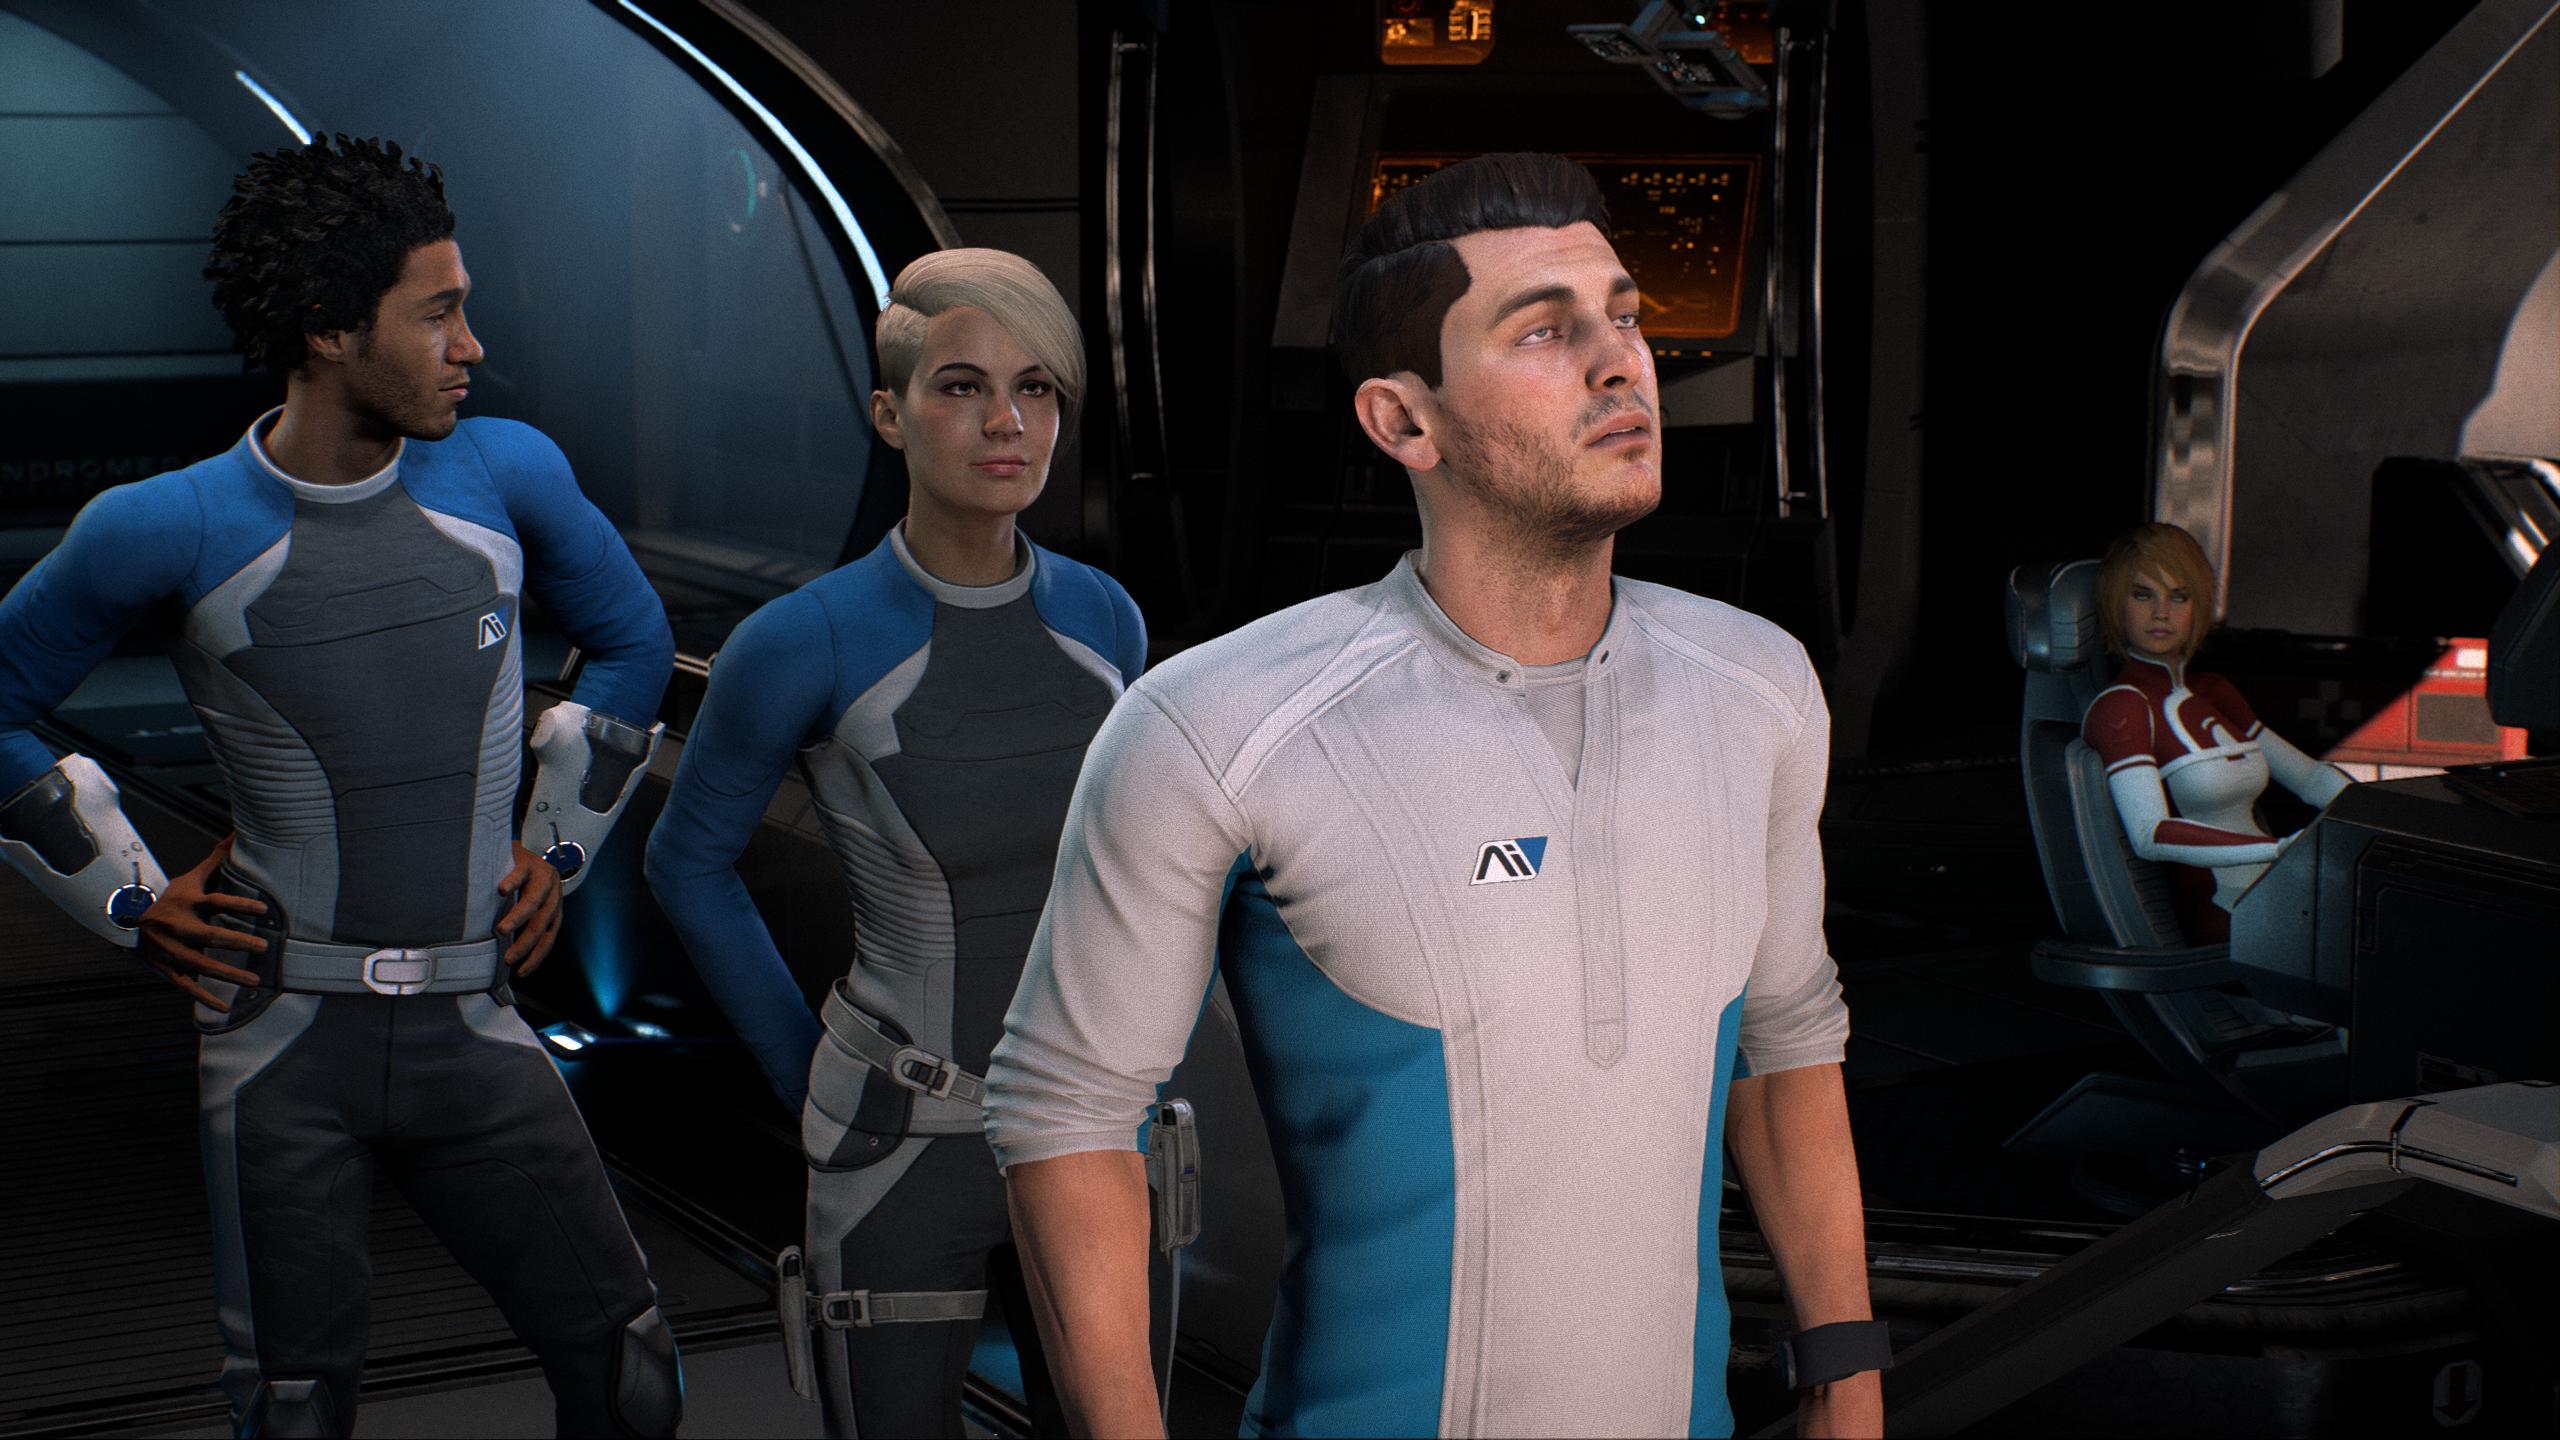 MassEffectAndromeda_2017_10_05_19_32_41_031.png - Mass Effect: Andromeda